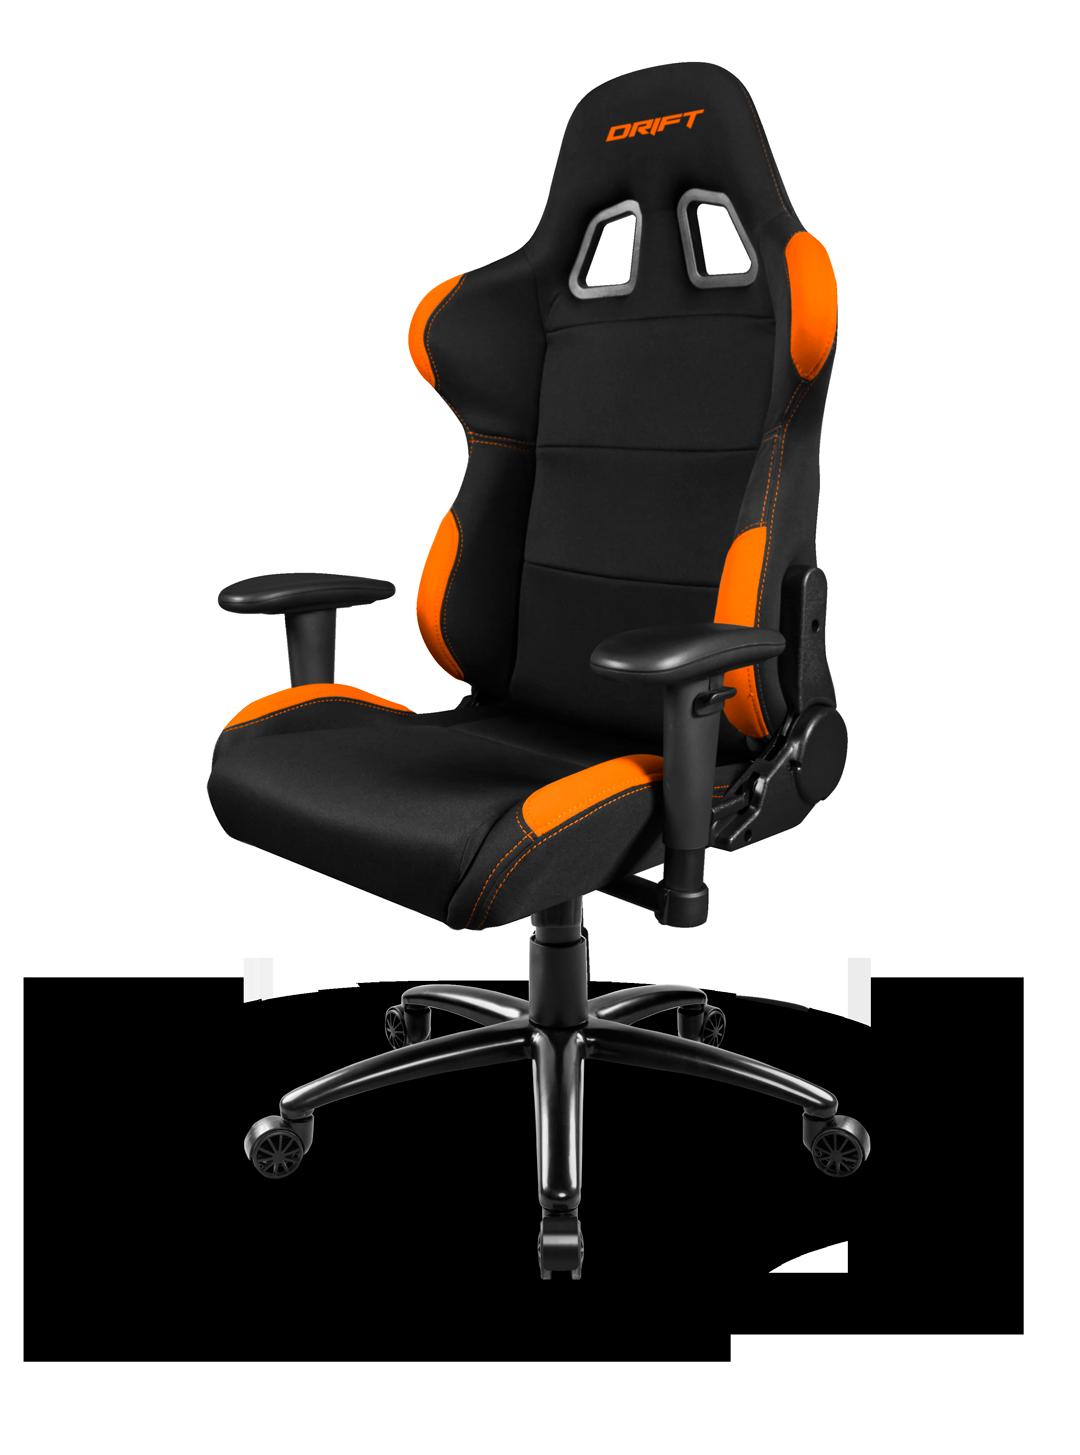 Silla gaming drift dr100 negra naranja for Precio de silla gamer